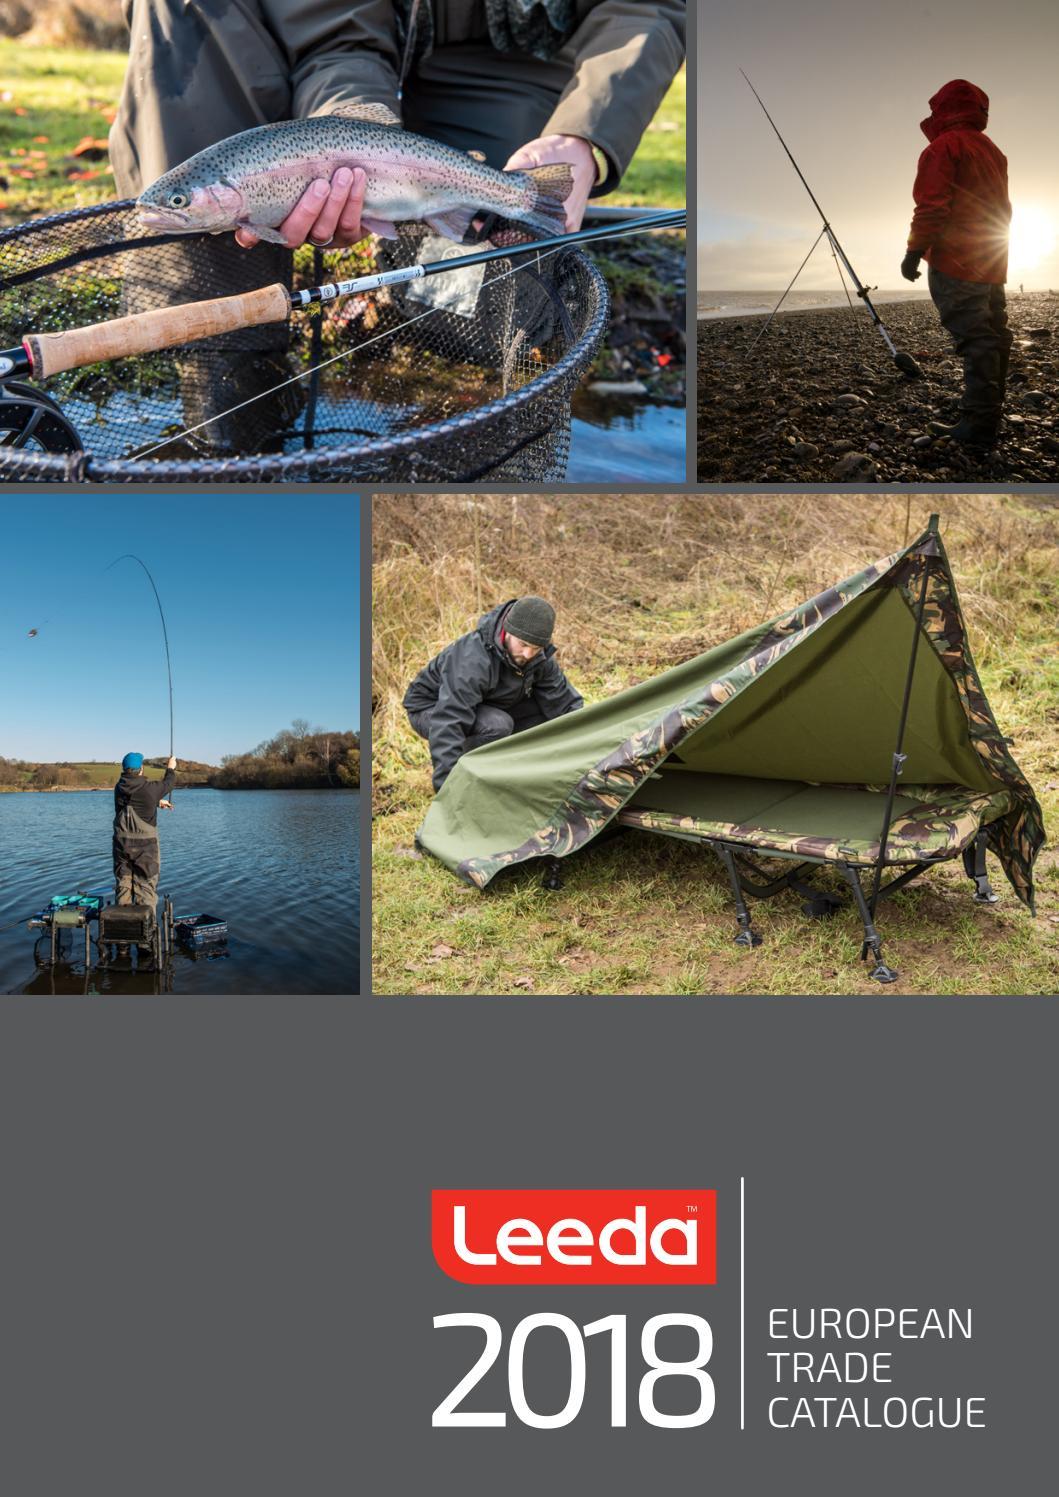 Leeda Profil Polyhead Trout 10ft Tapered Leaders Full Range Game Fly Fishing